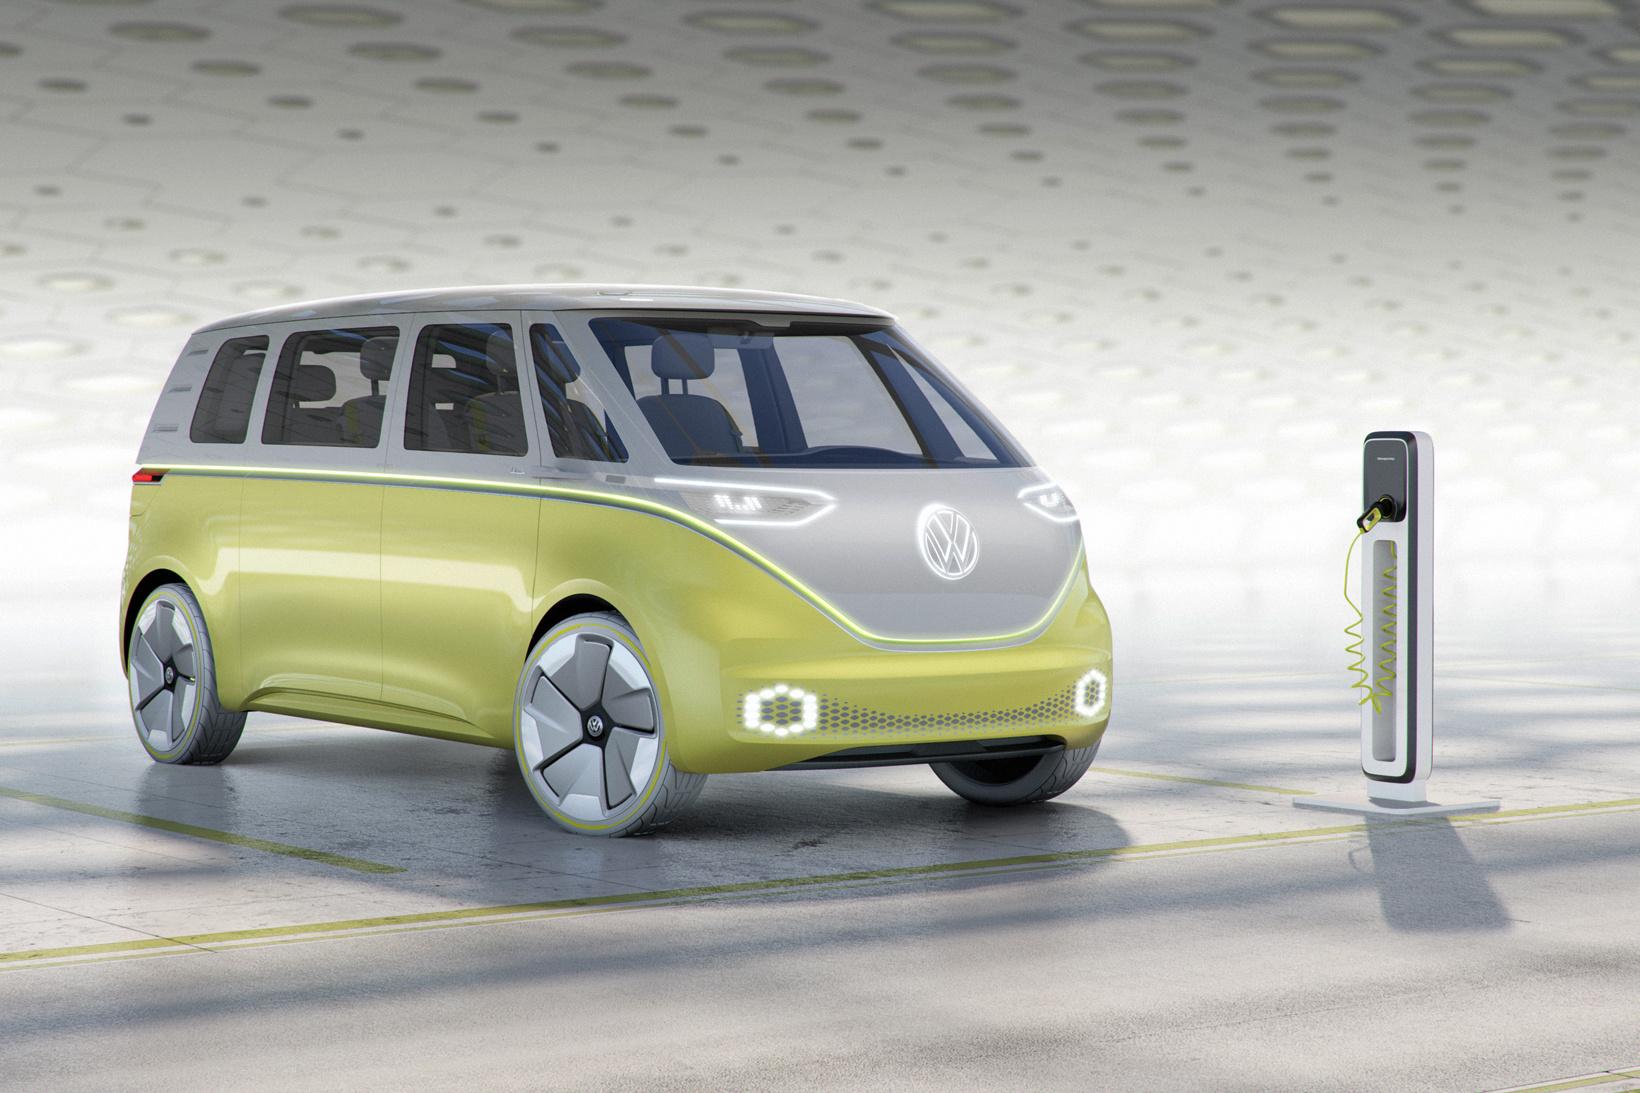 volkswagen-id-buzz-concept-car-1